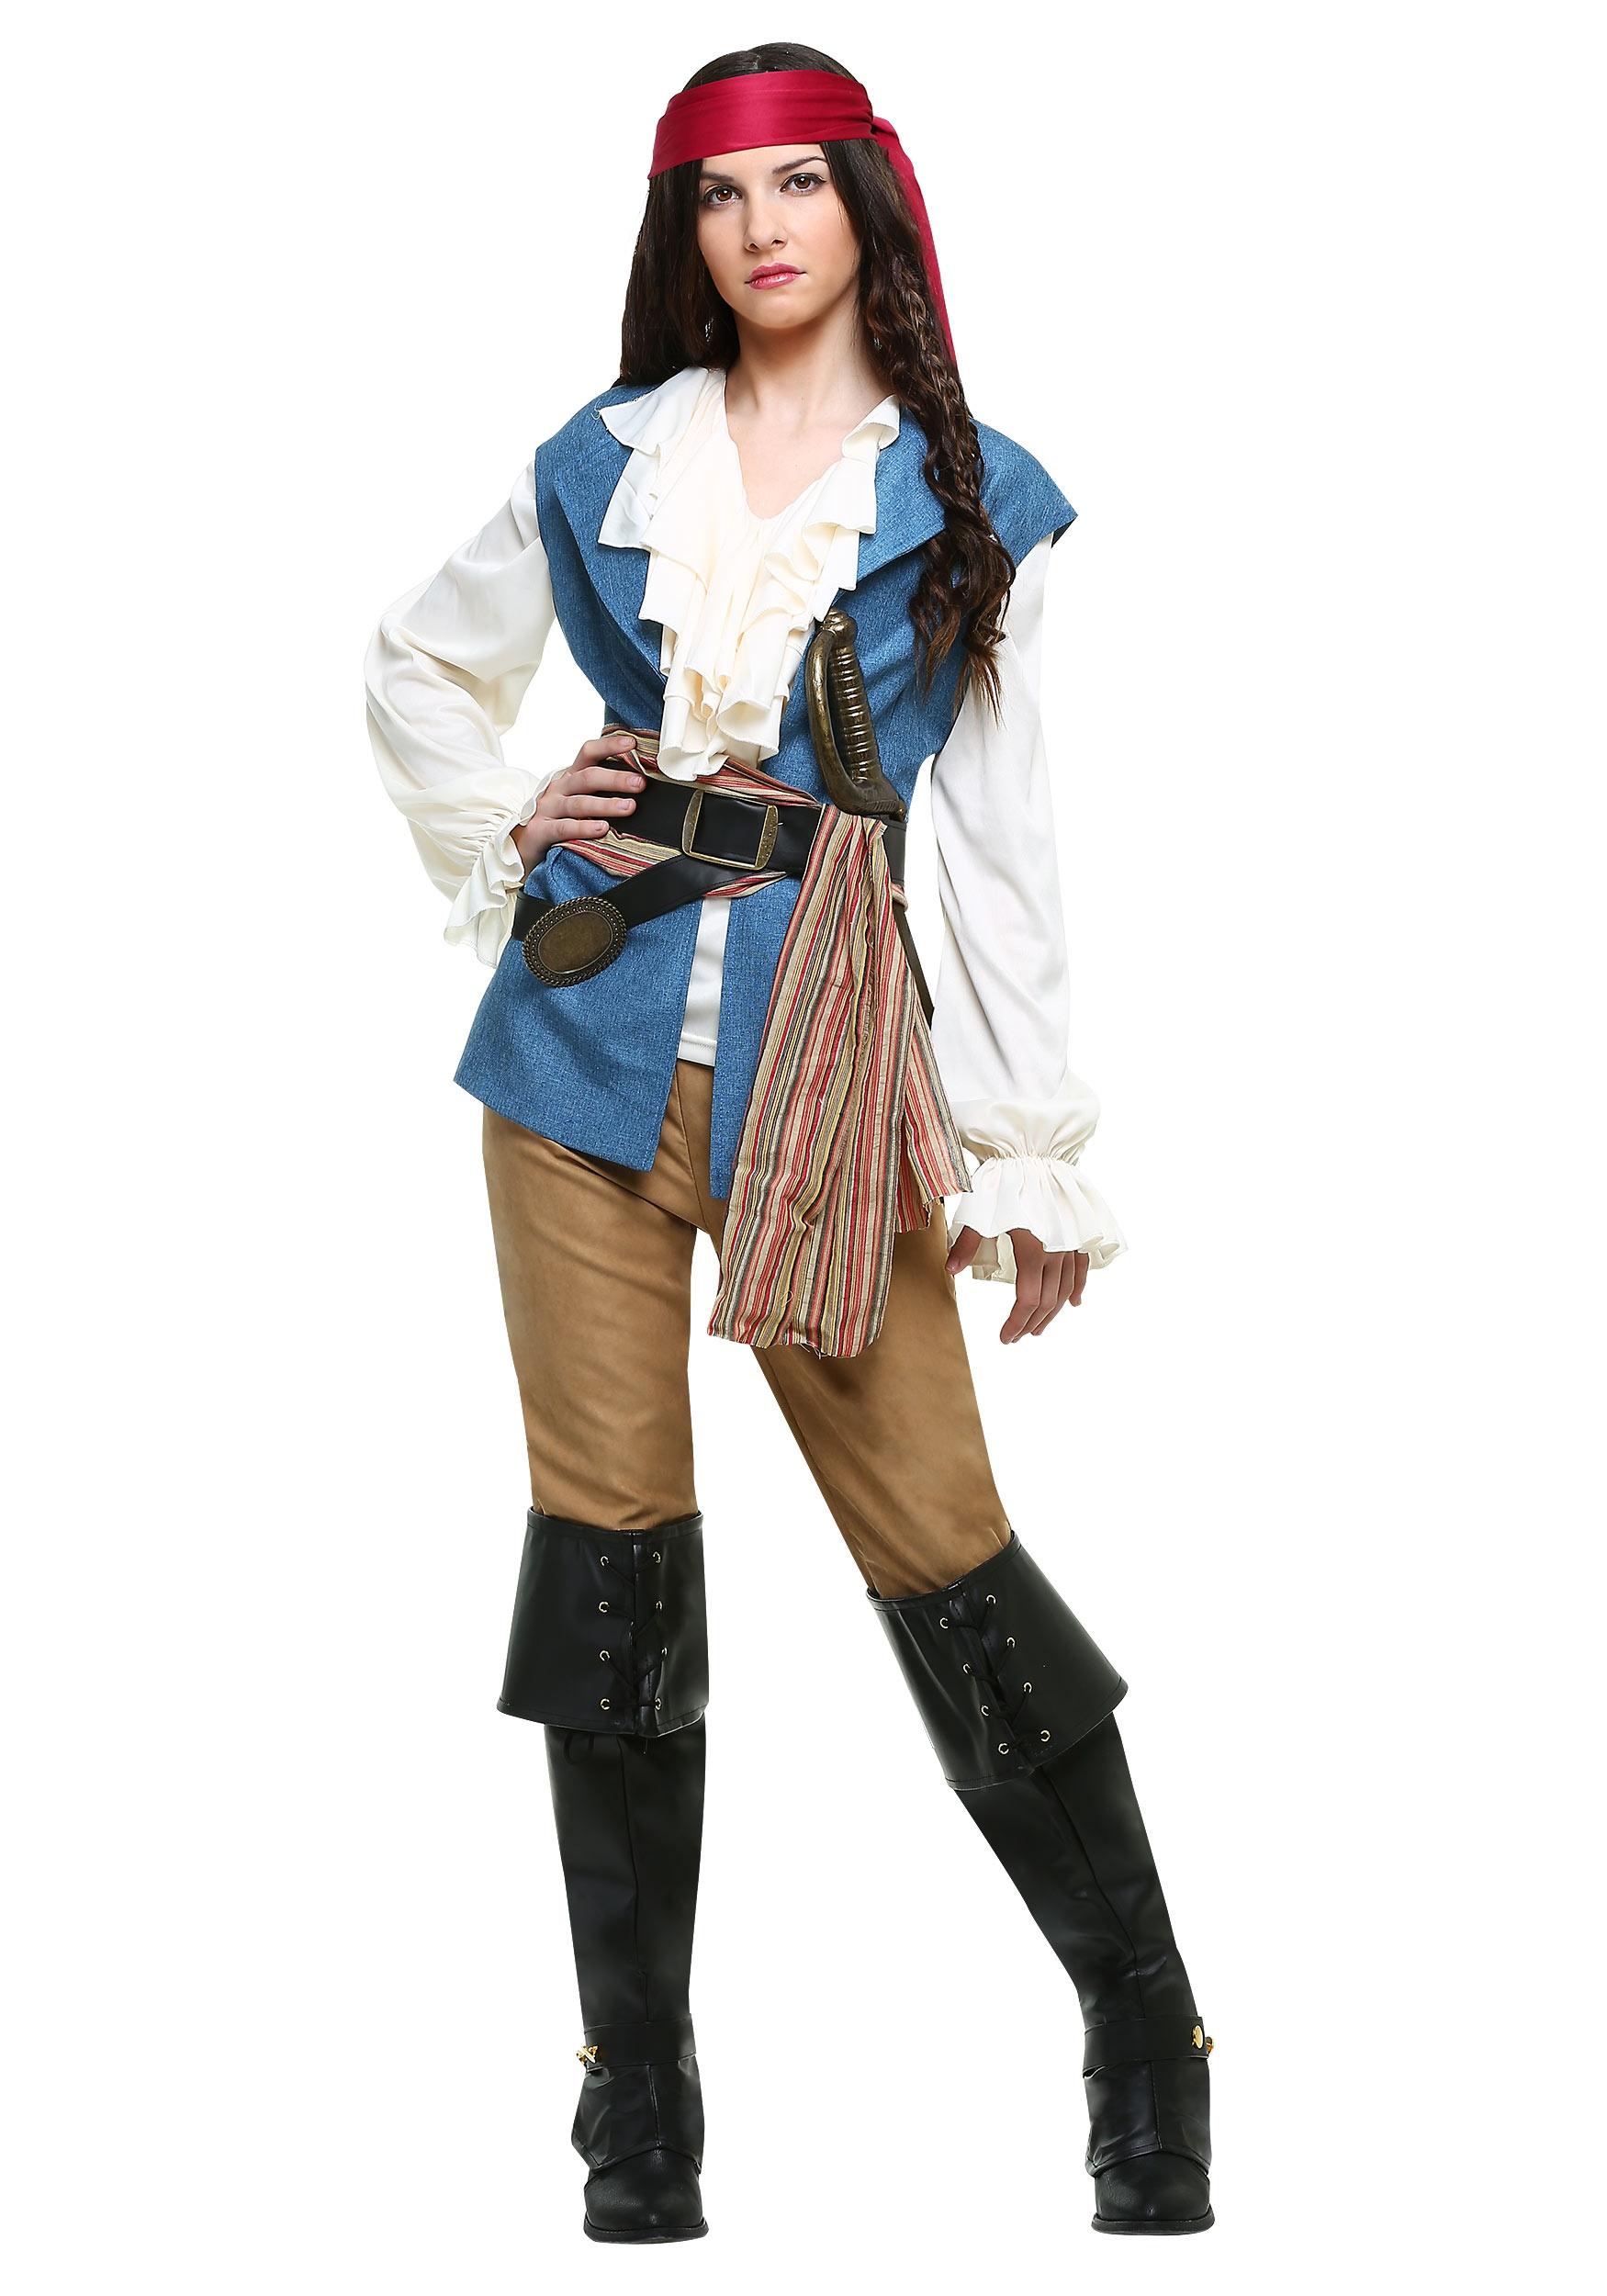 Seven Seas Sweetie Costume for Women